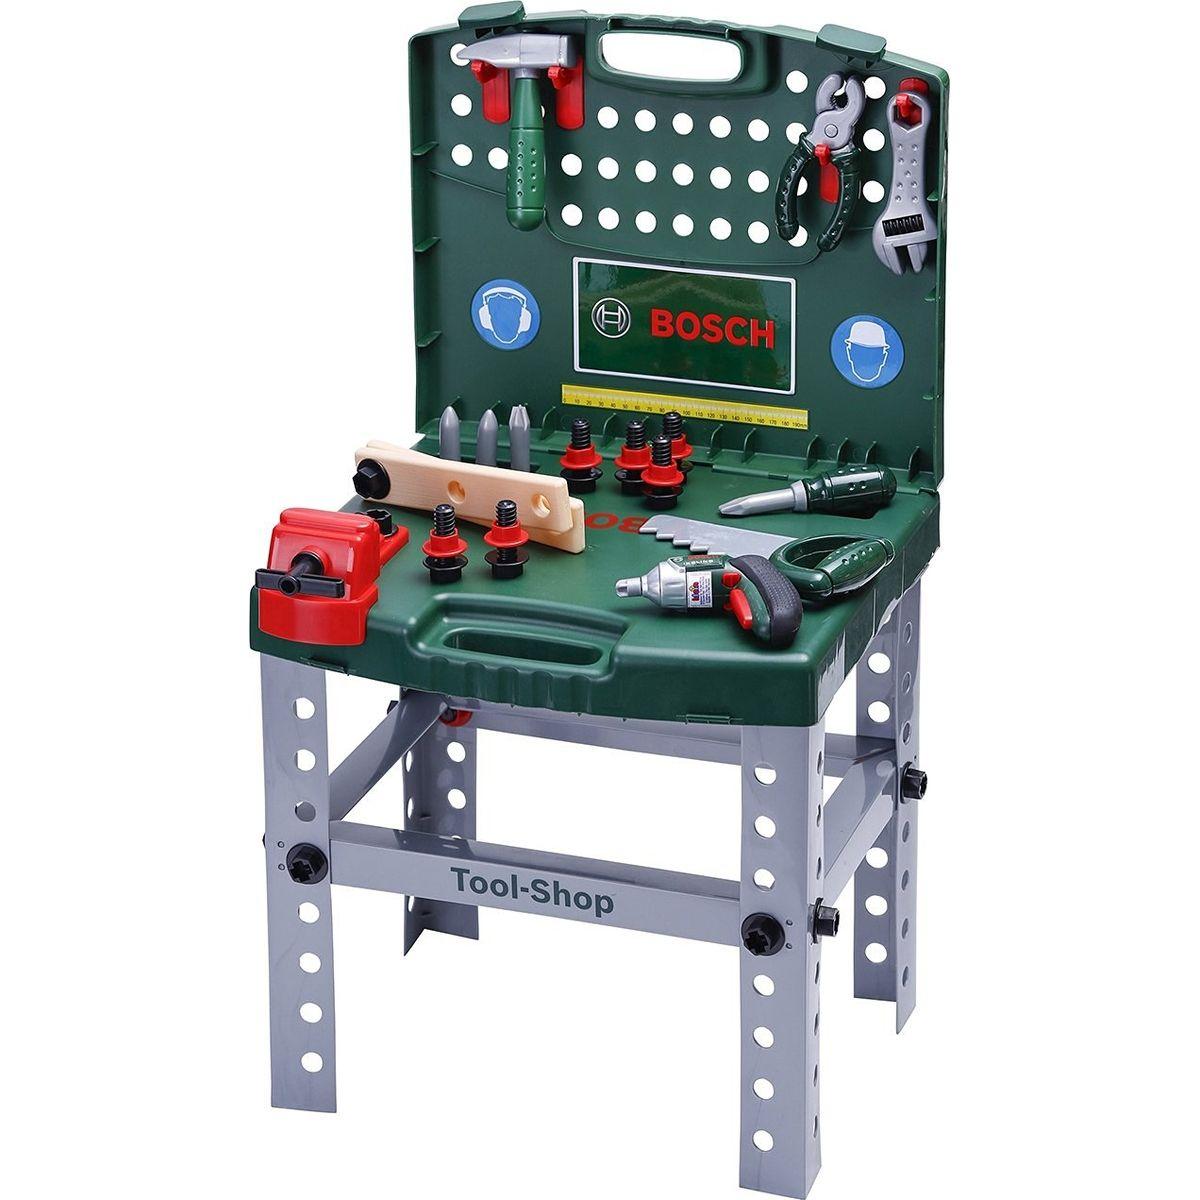 Klein 8686 - Mobilný pracovný stôl BOSCH v kufríku